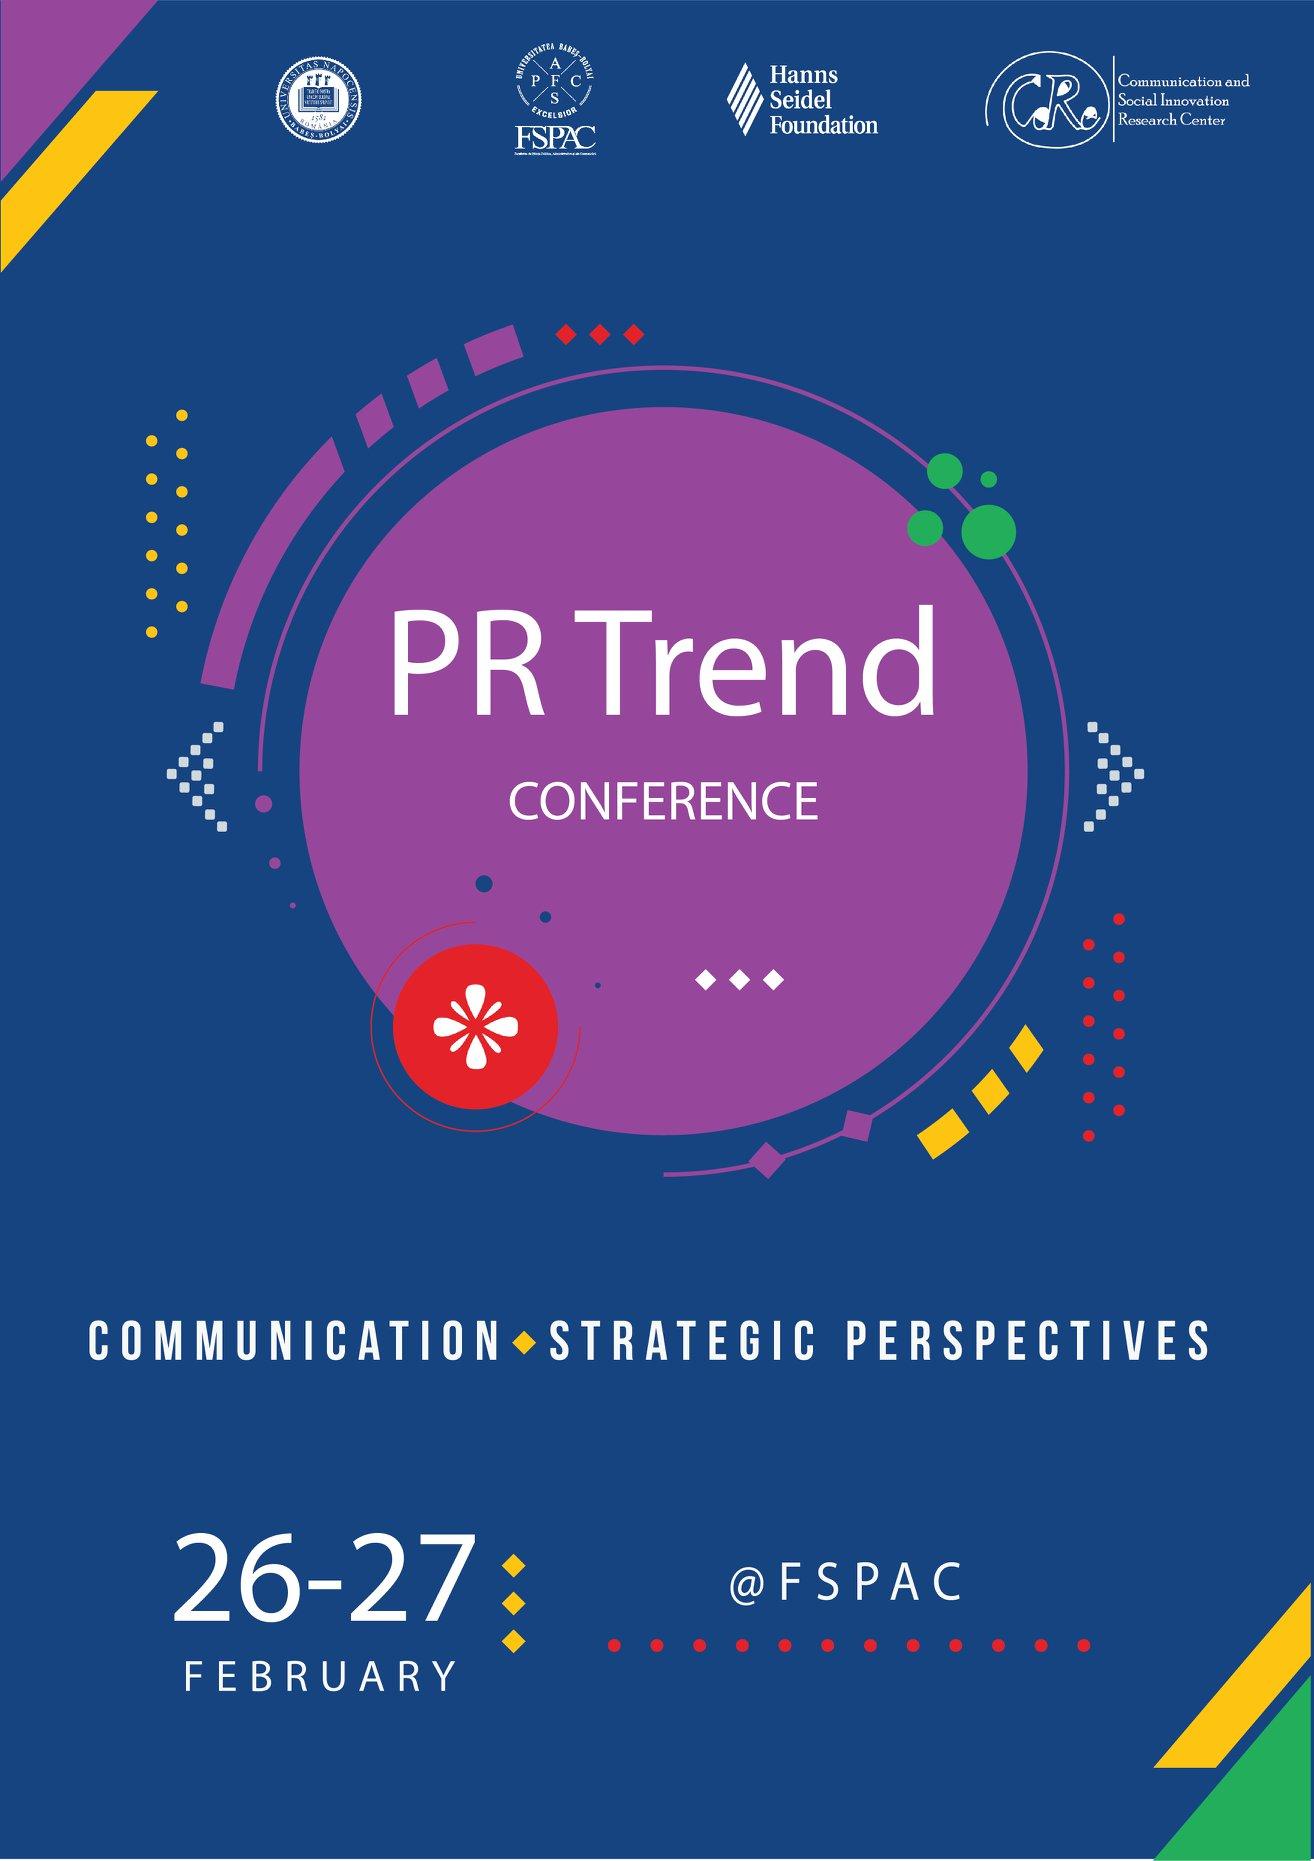 PR Trend 2018